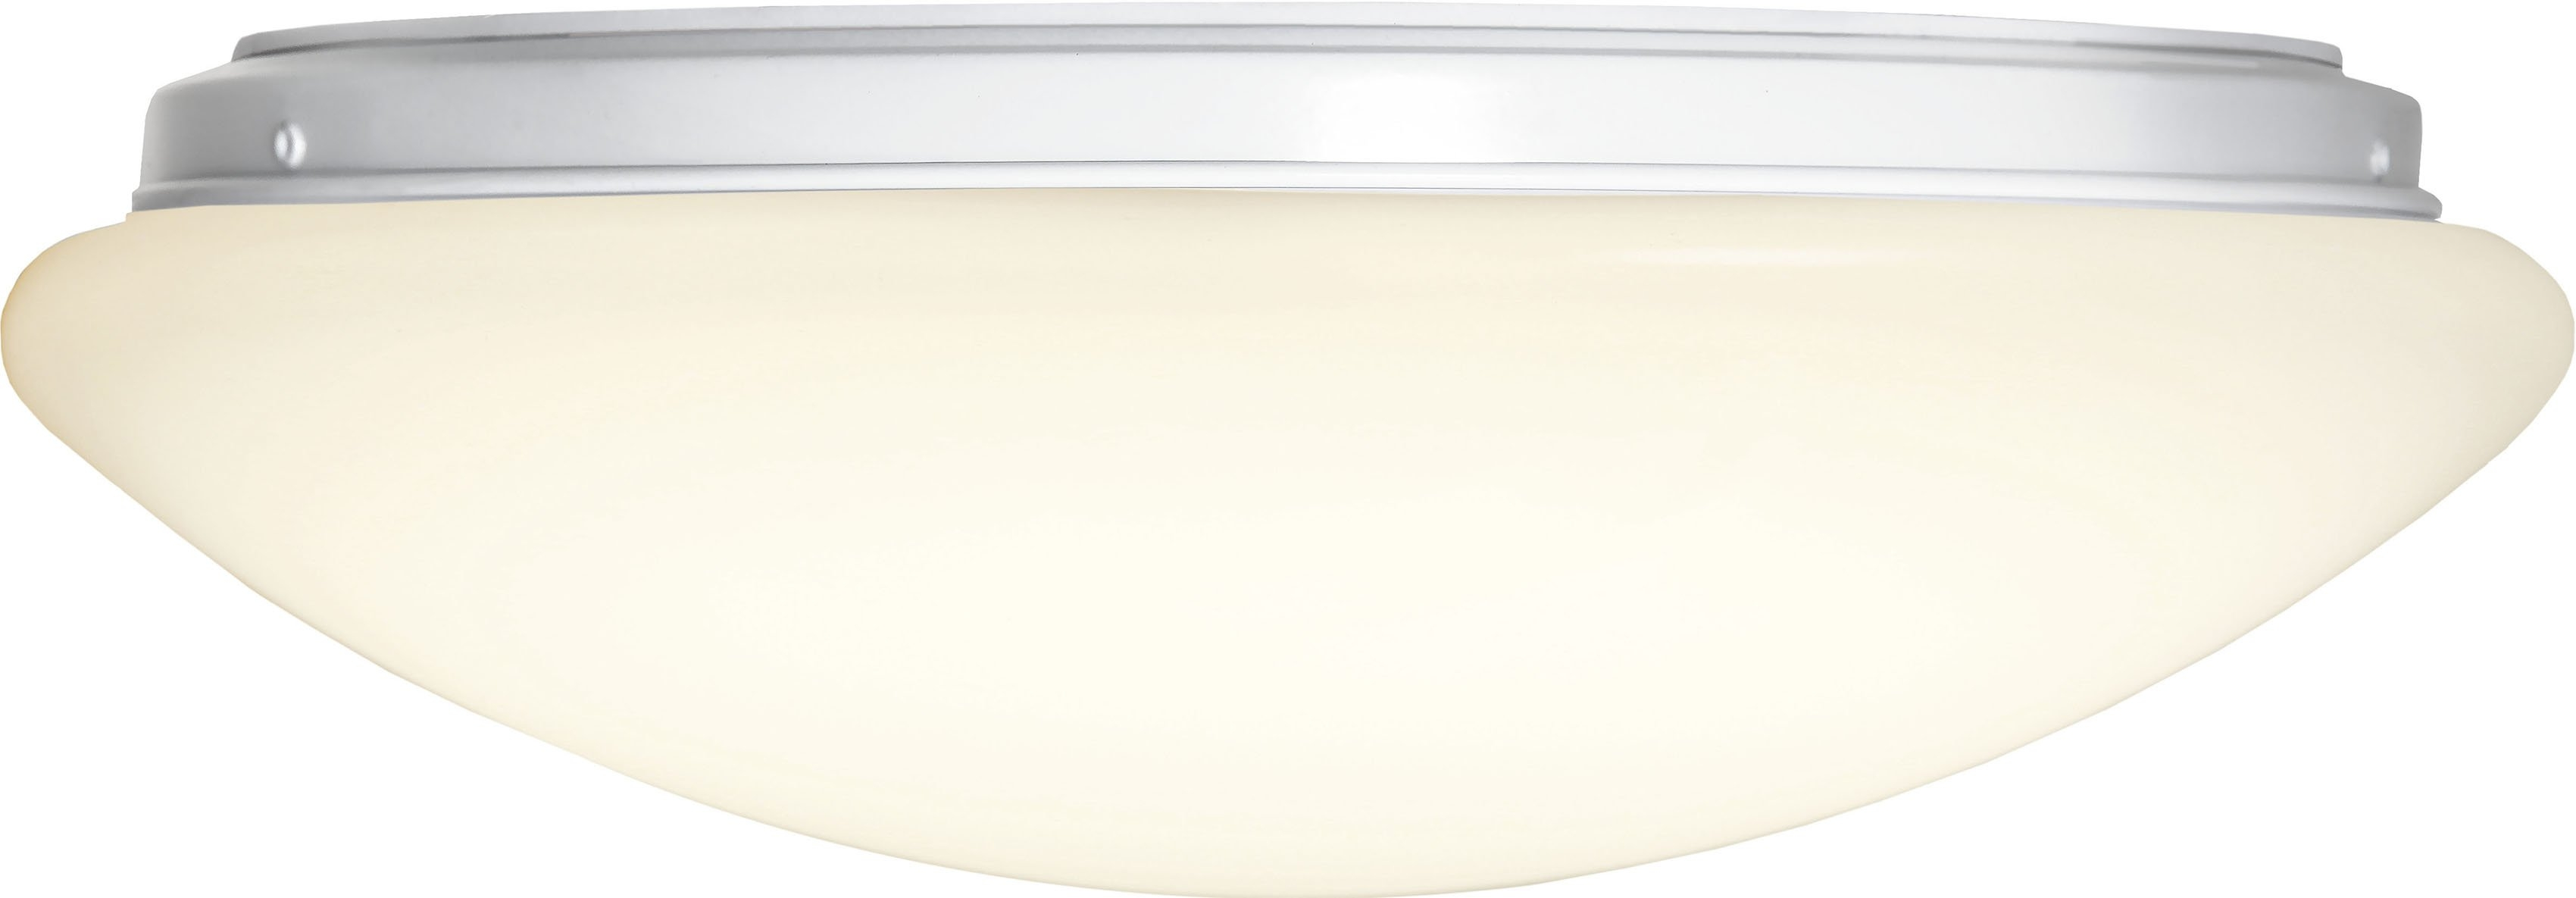 STAR TRADING led-plafondlamp Integra Ceiling nu online bestellen